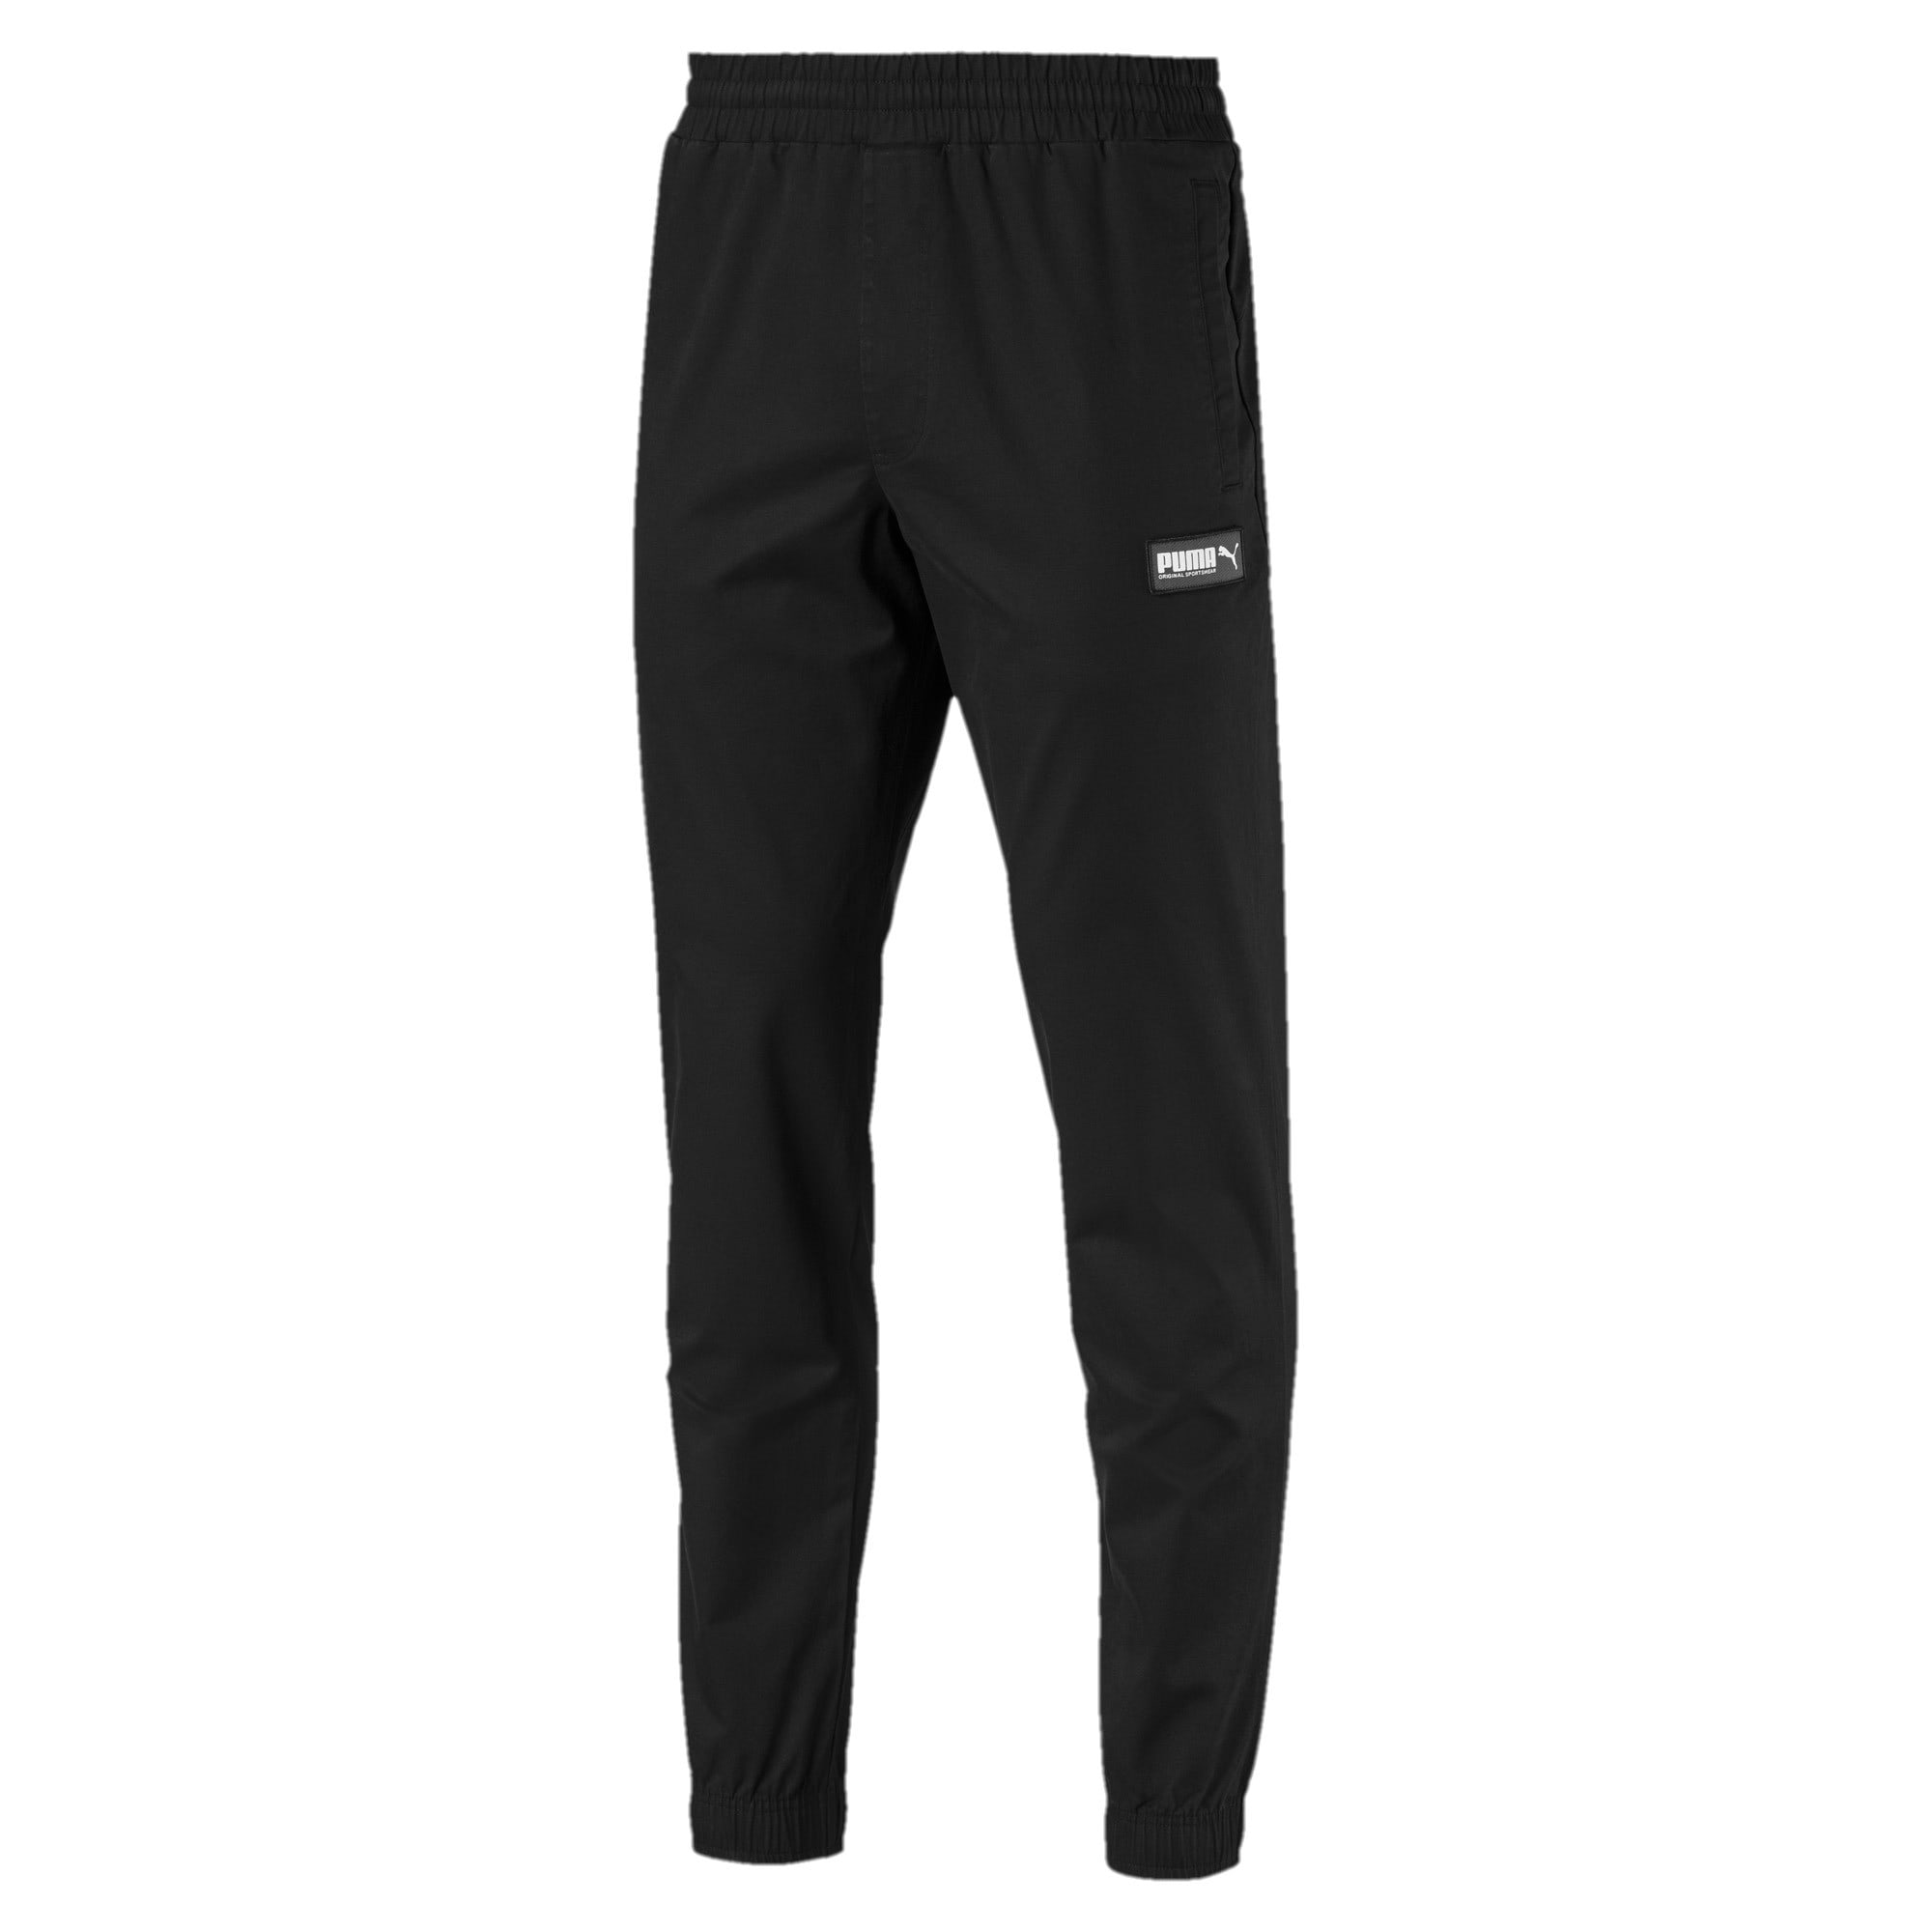 Thumbnail 2 of Fusion Pants, Puma Black, medium